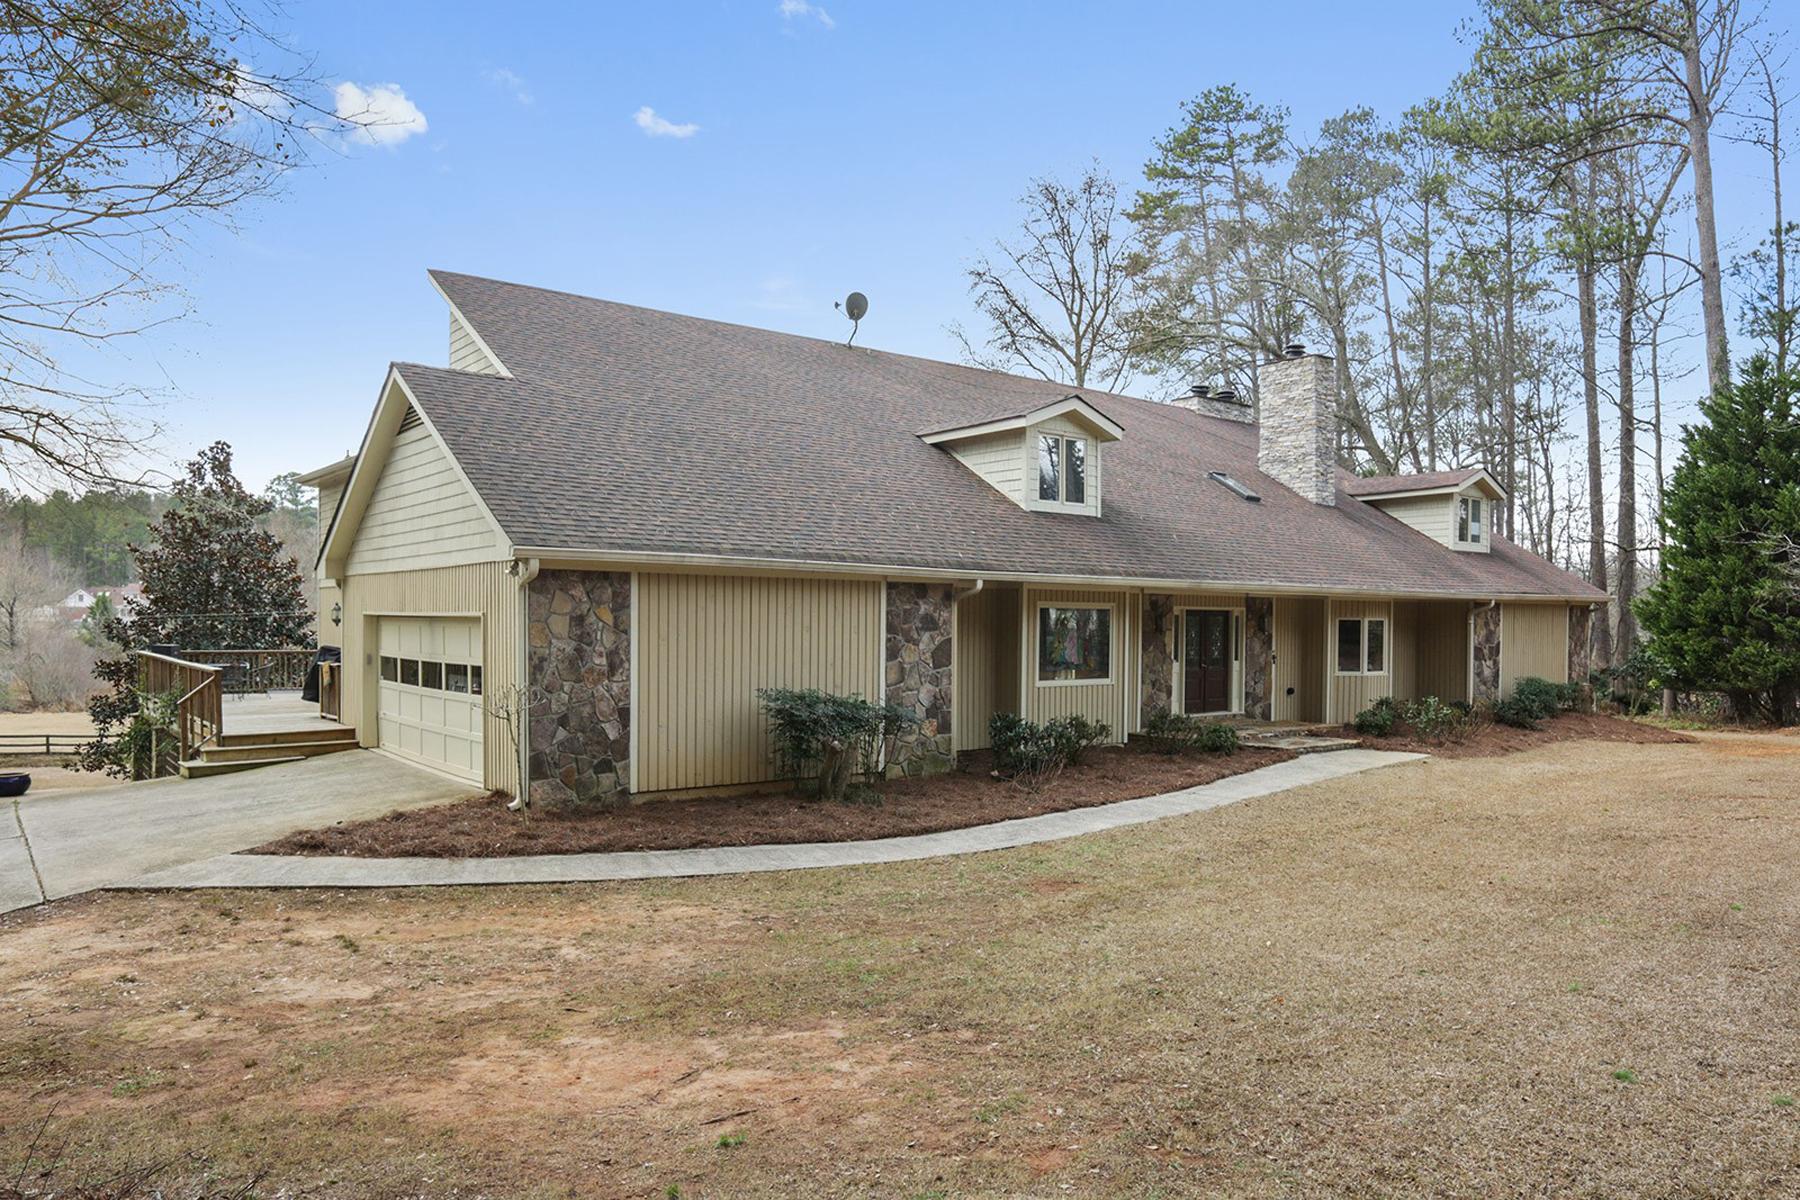 Maison unifamiliale pour l Vente à Serene Private 10 Acre 8 Bedroom Equestrian Property Just Minutes From Hwy. 85 1004 Mill Creek Run Suwanee, Georgia, 30024 États-Unis